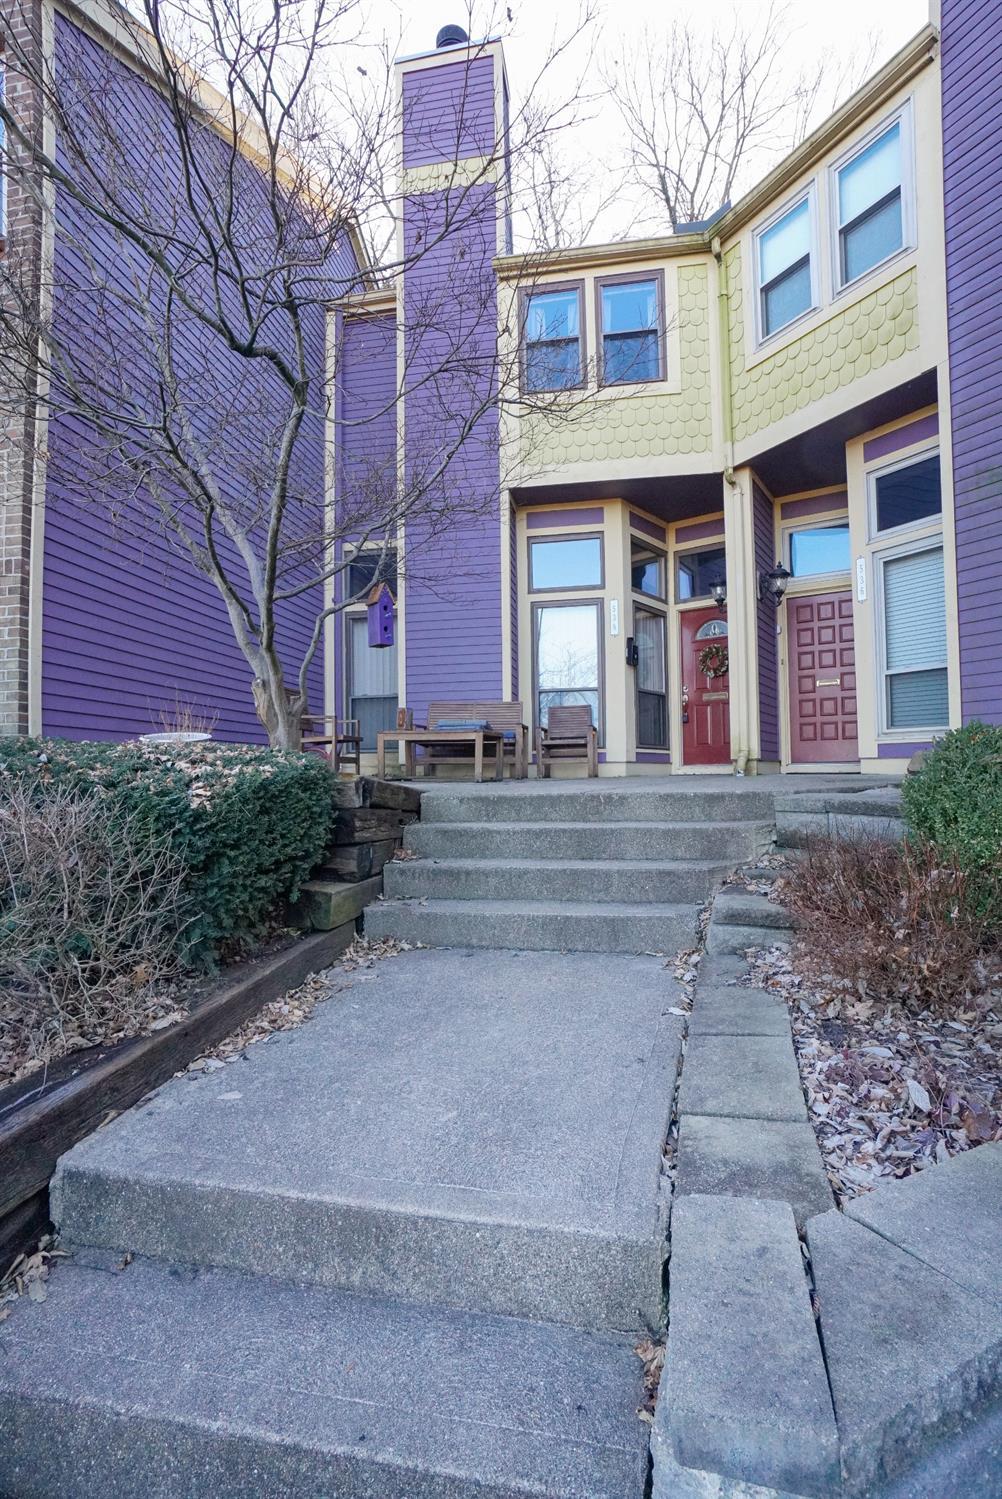 Property for sale at 538 Tusculum Avenue, Cincinnati,  OH 45226